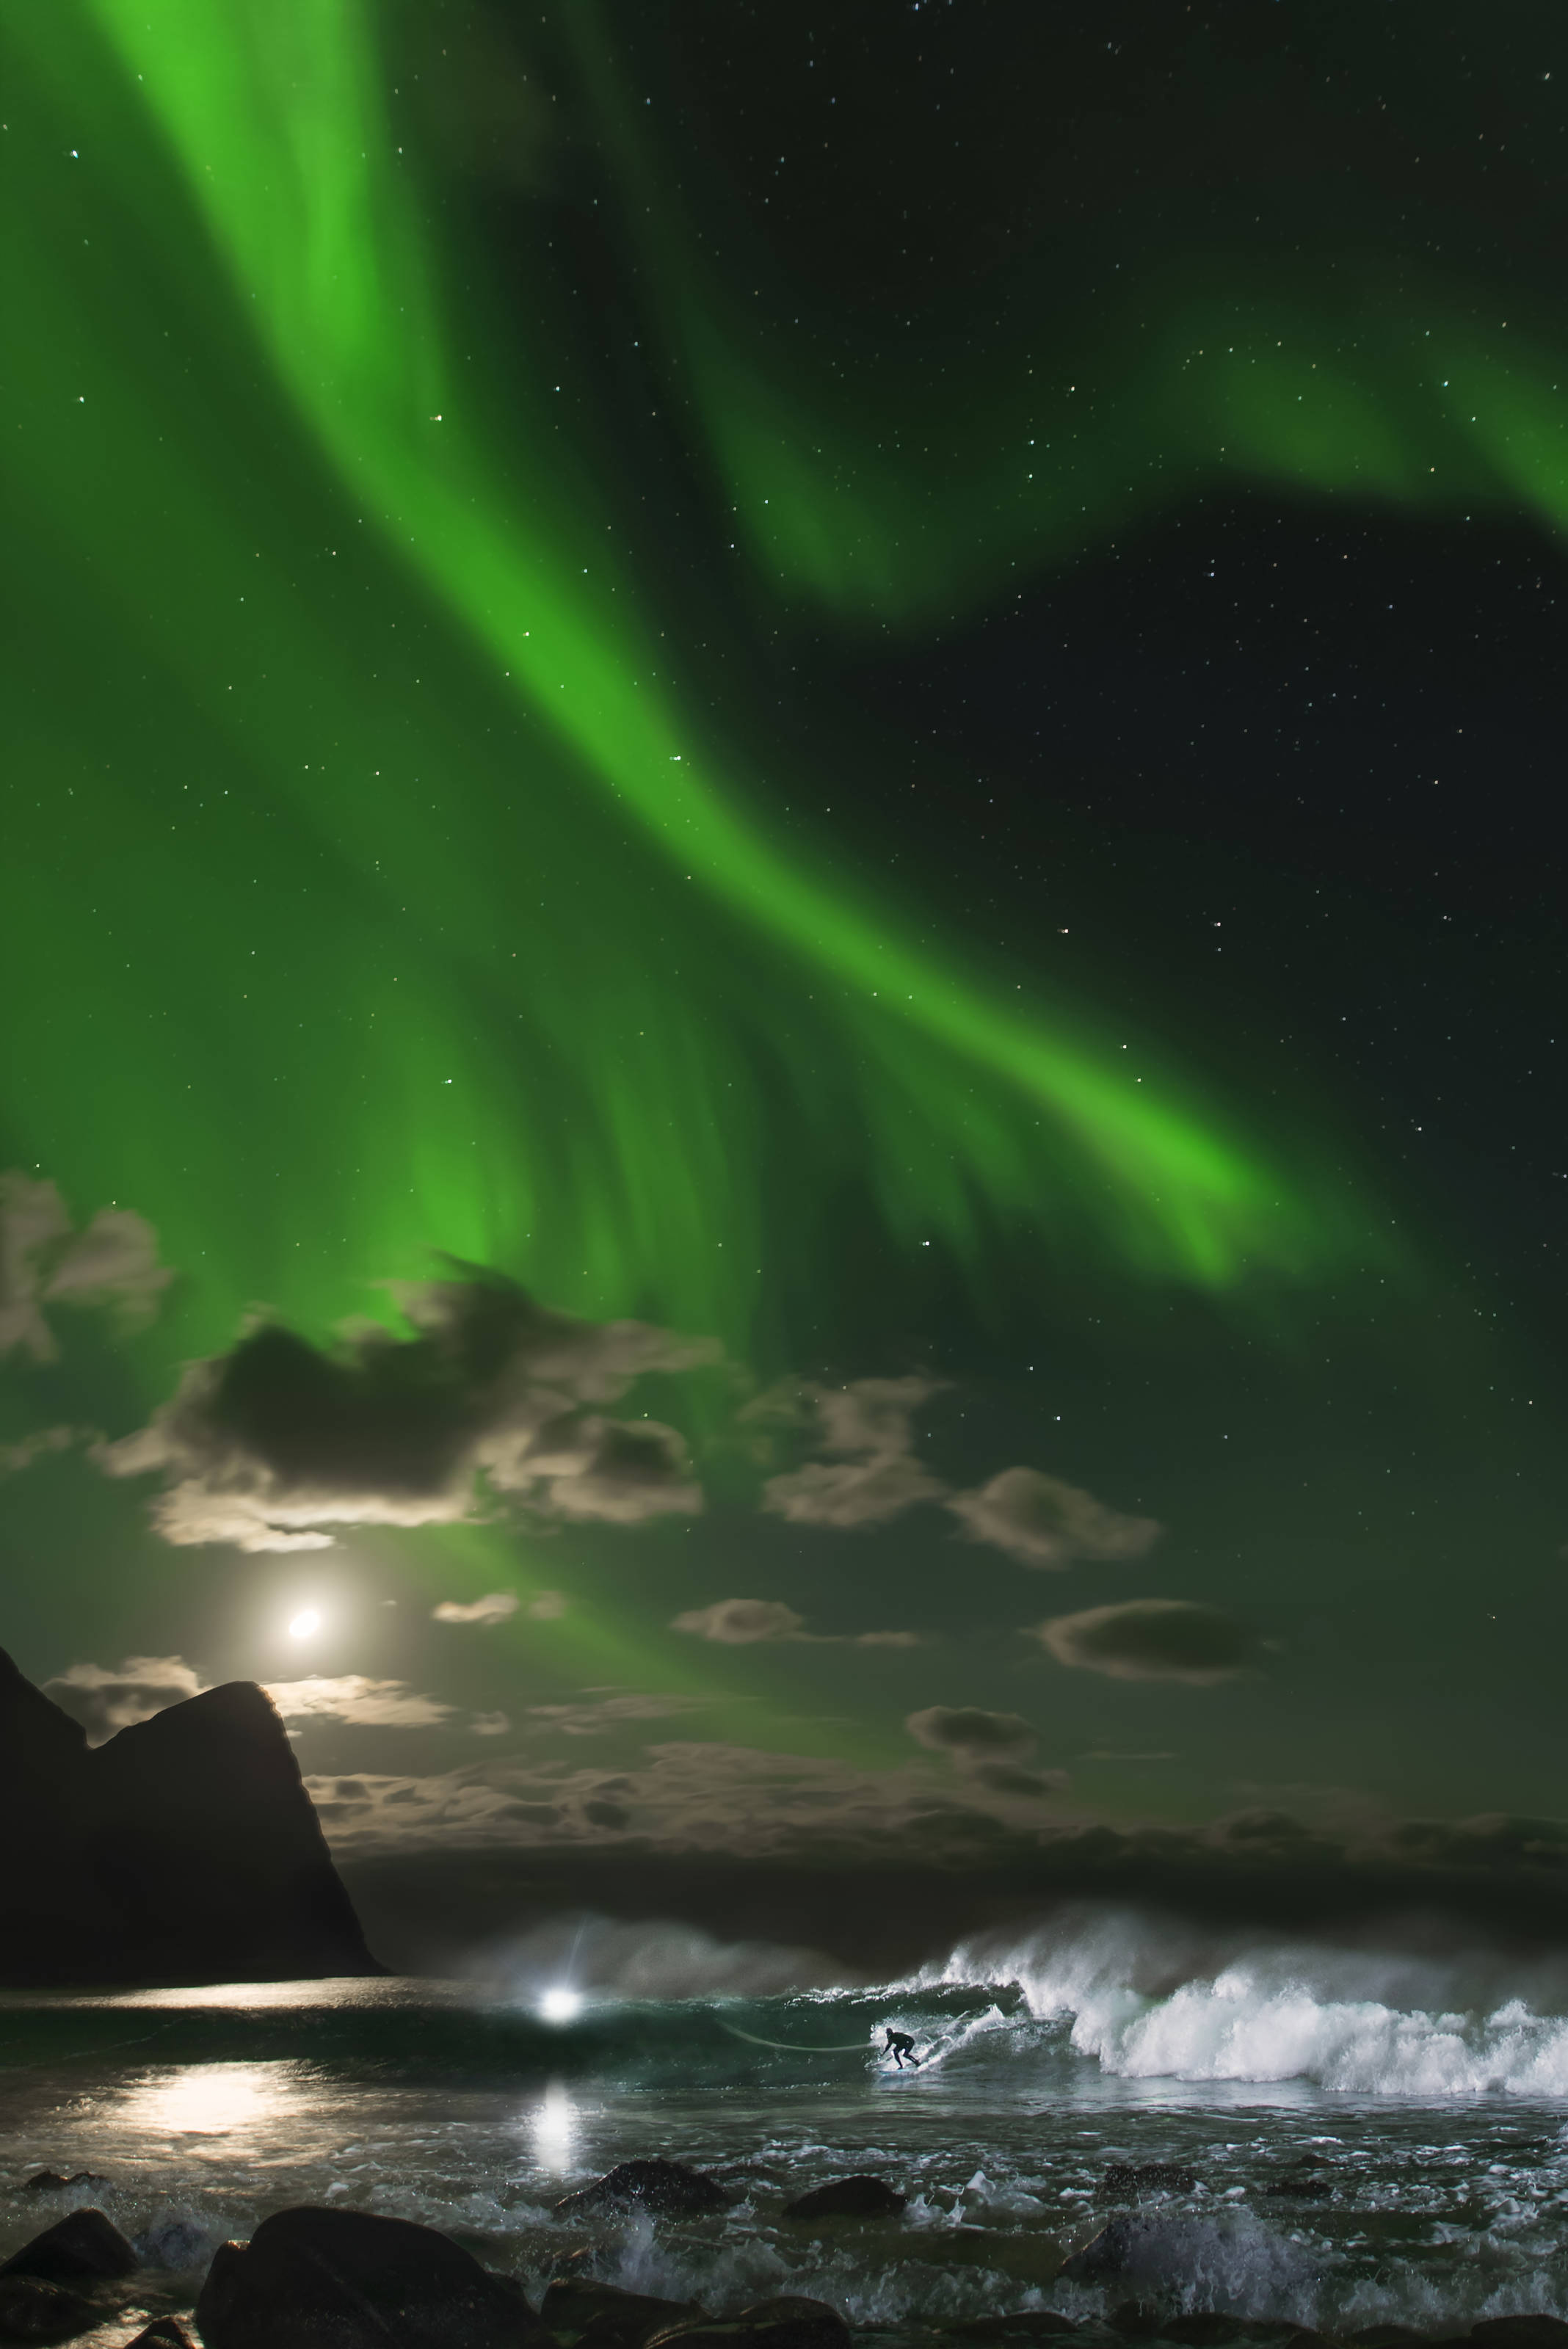 Mick Fanning surft unter den Nordlichtern an der Küste Norwegens. Credit: Red Bull Content Pool